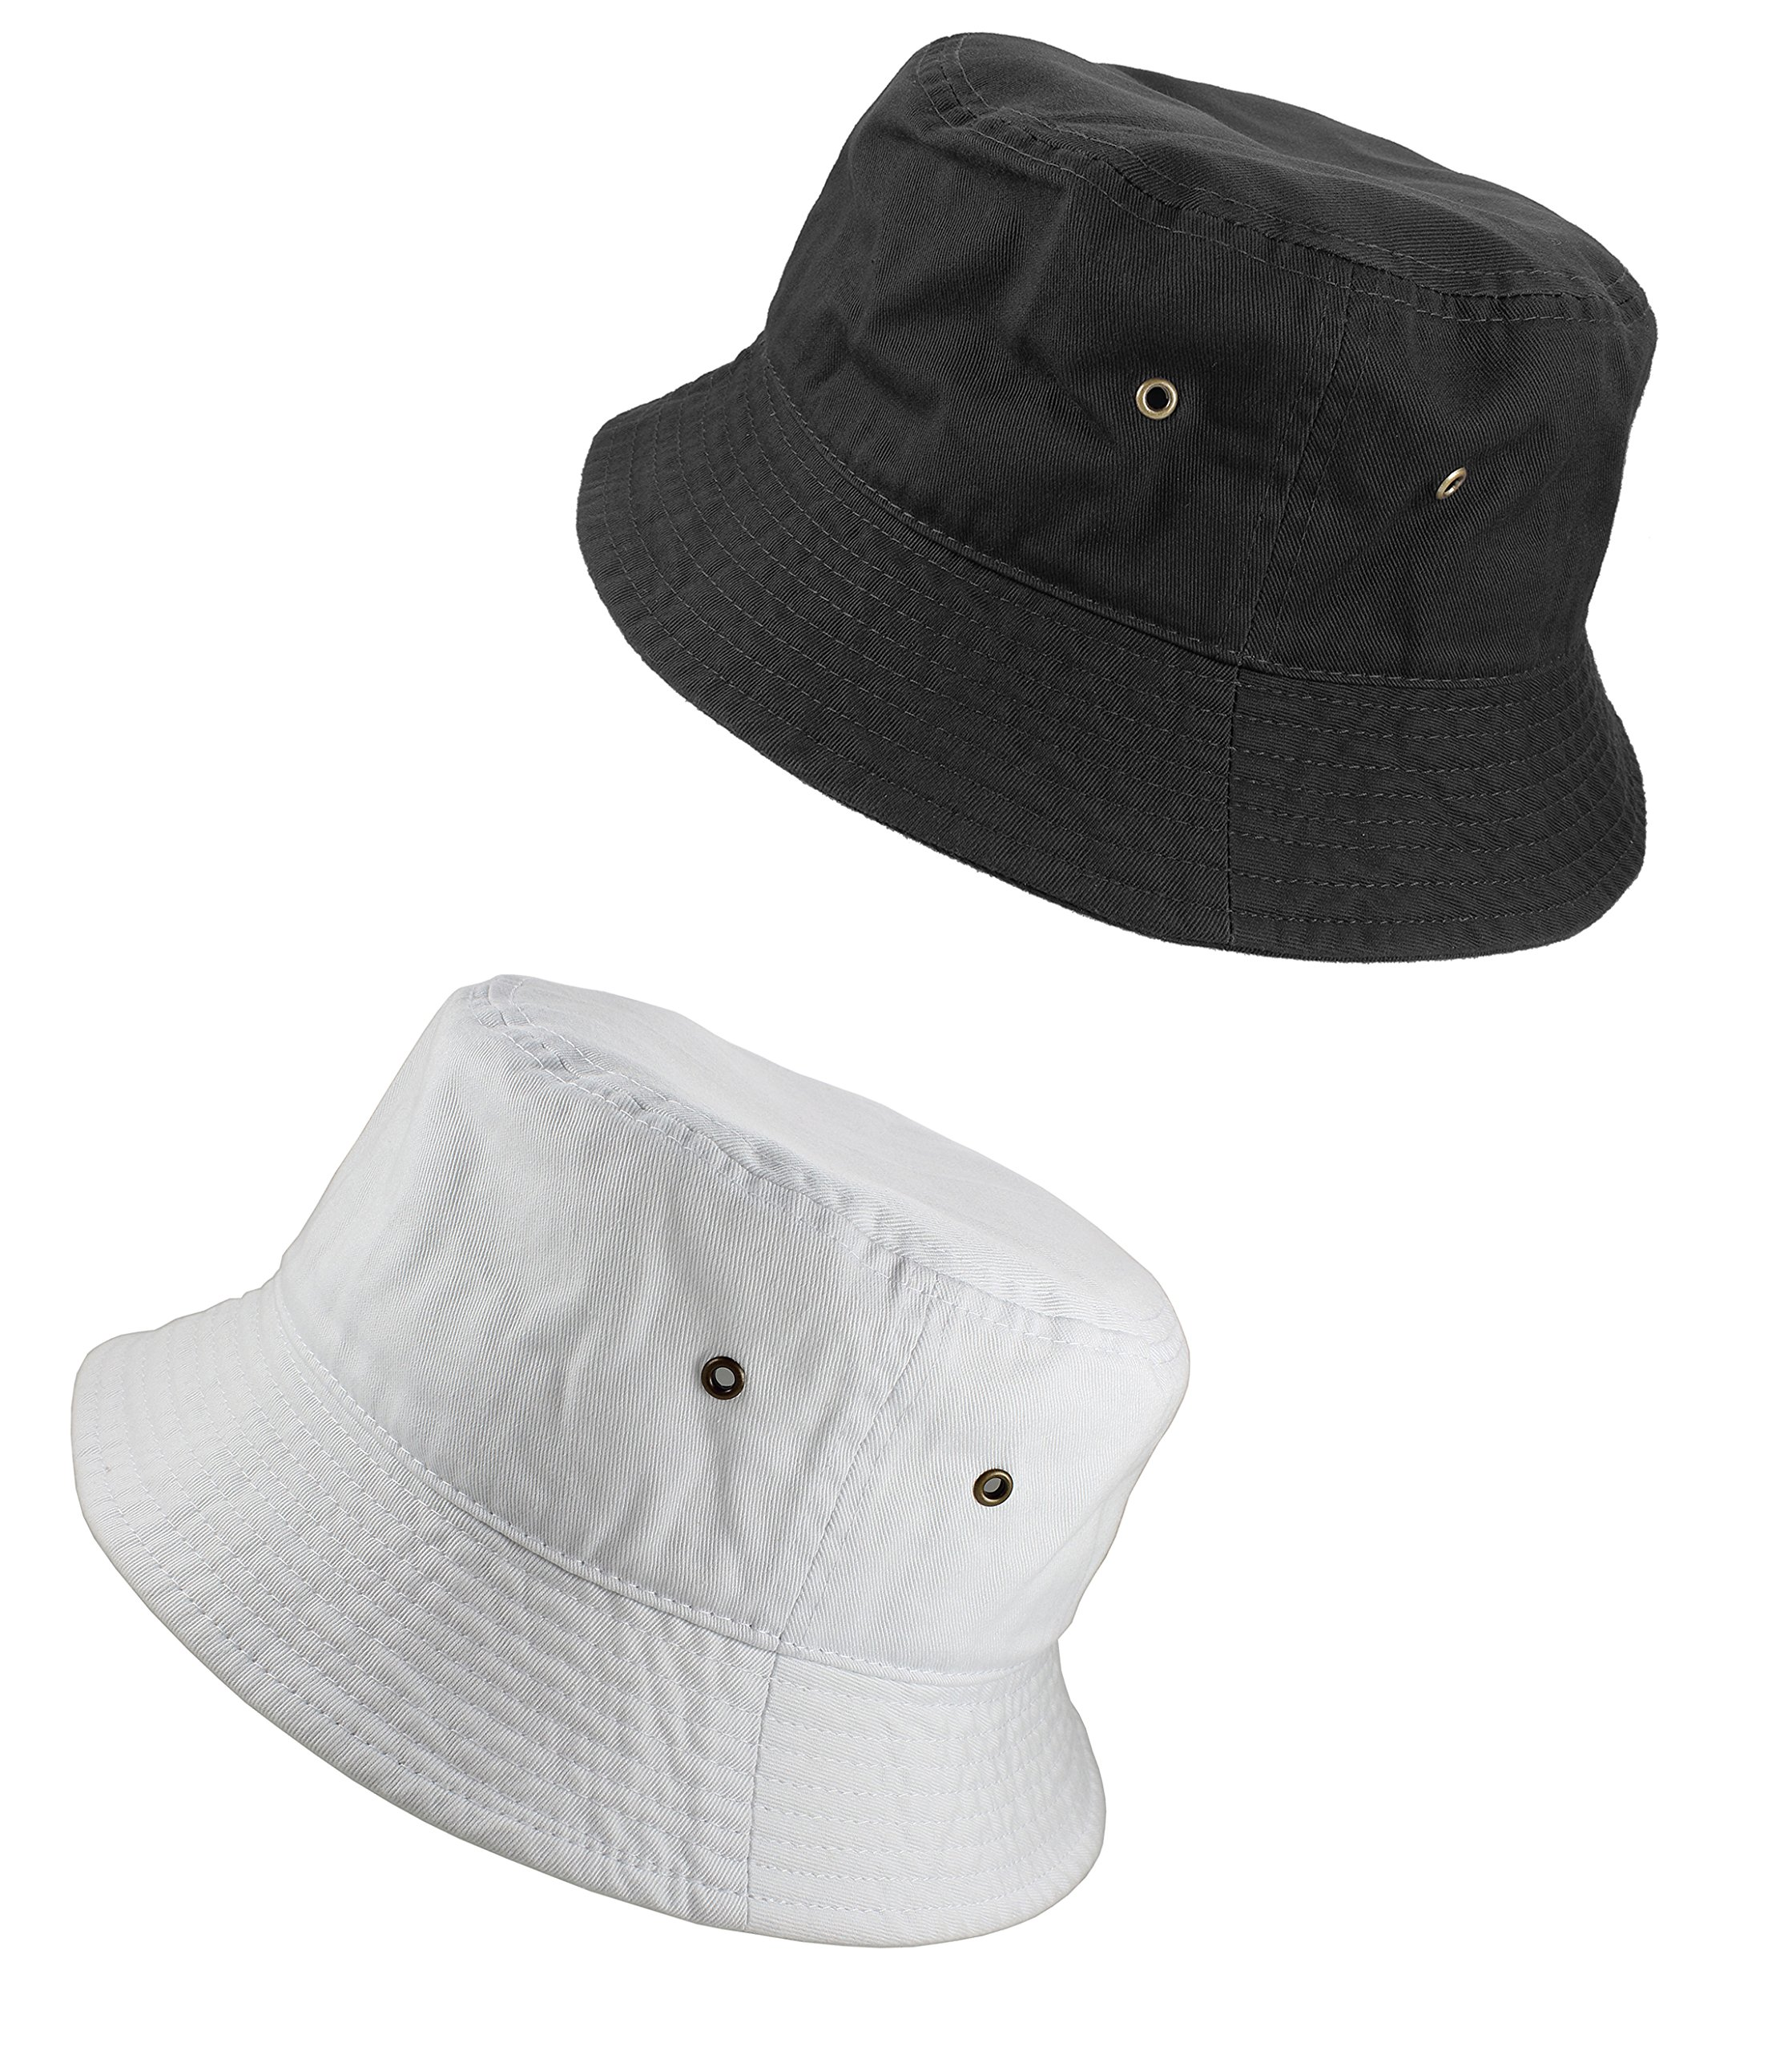 Gelante 100% Cotton Packable Fishing Hunting Sunmmer Travel Bucket Cap Hat 1900-Black/White-S/M